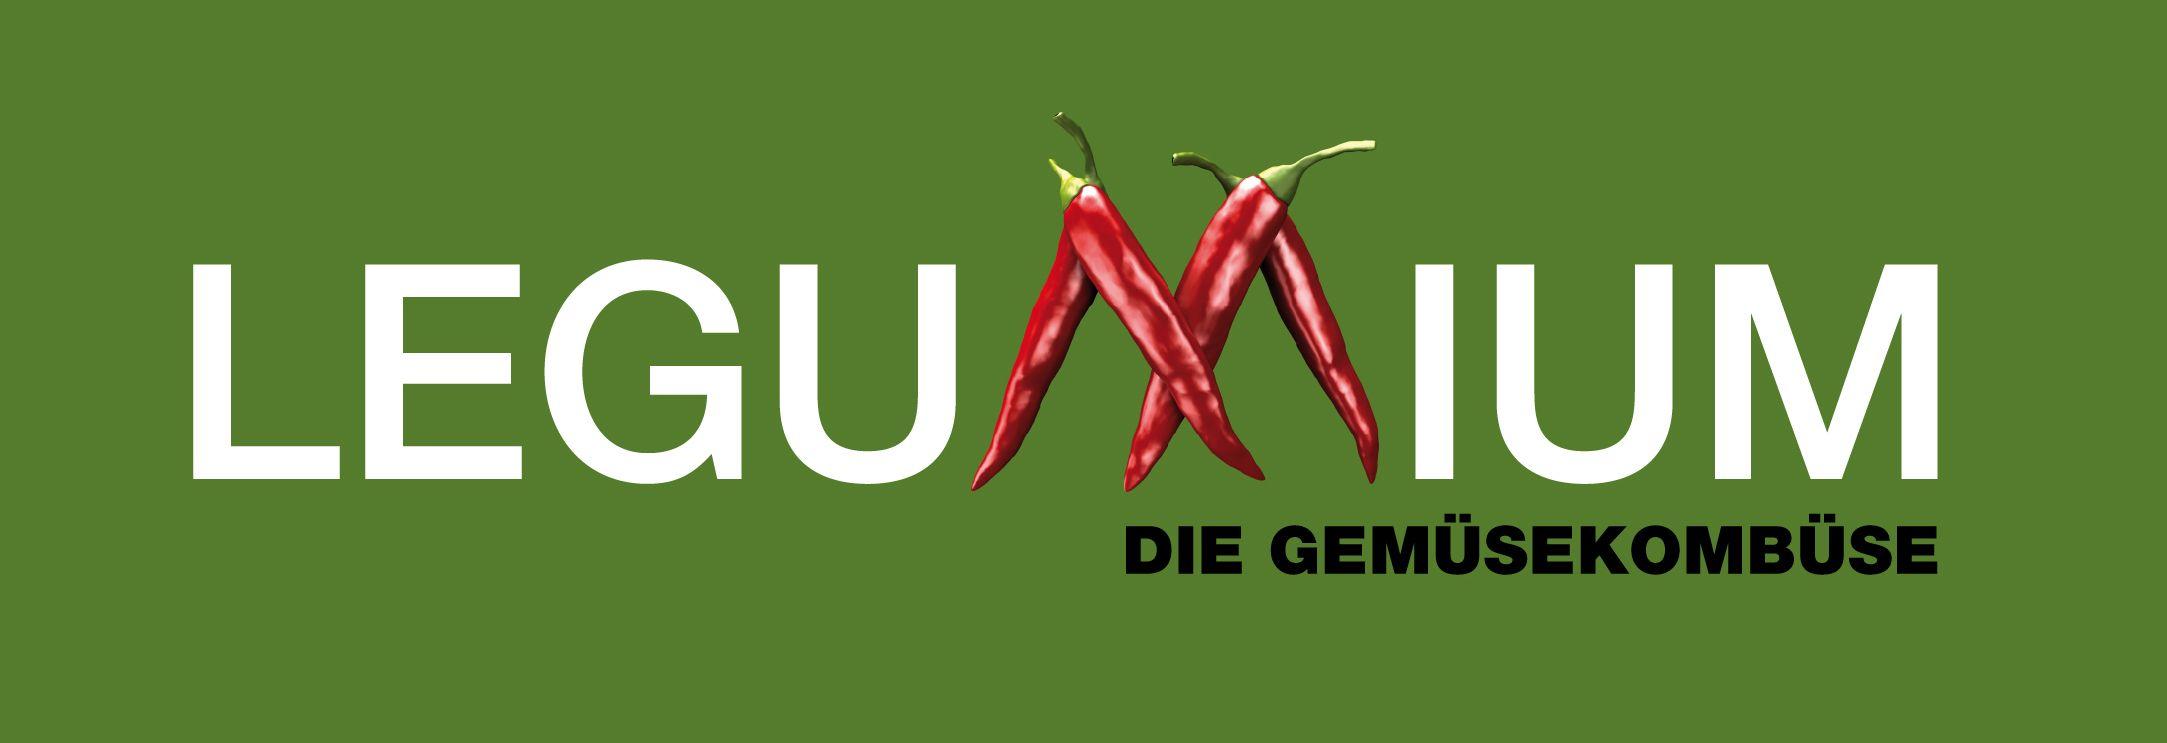 Legumium Logo Grün